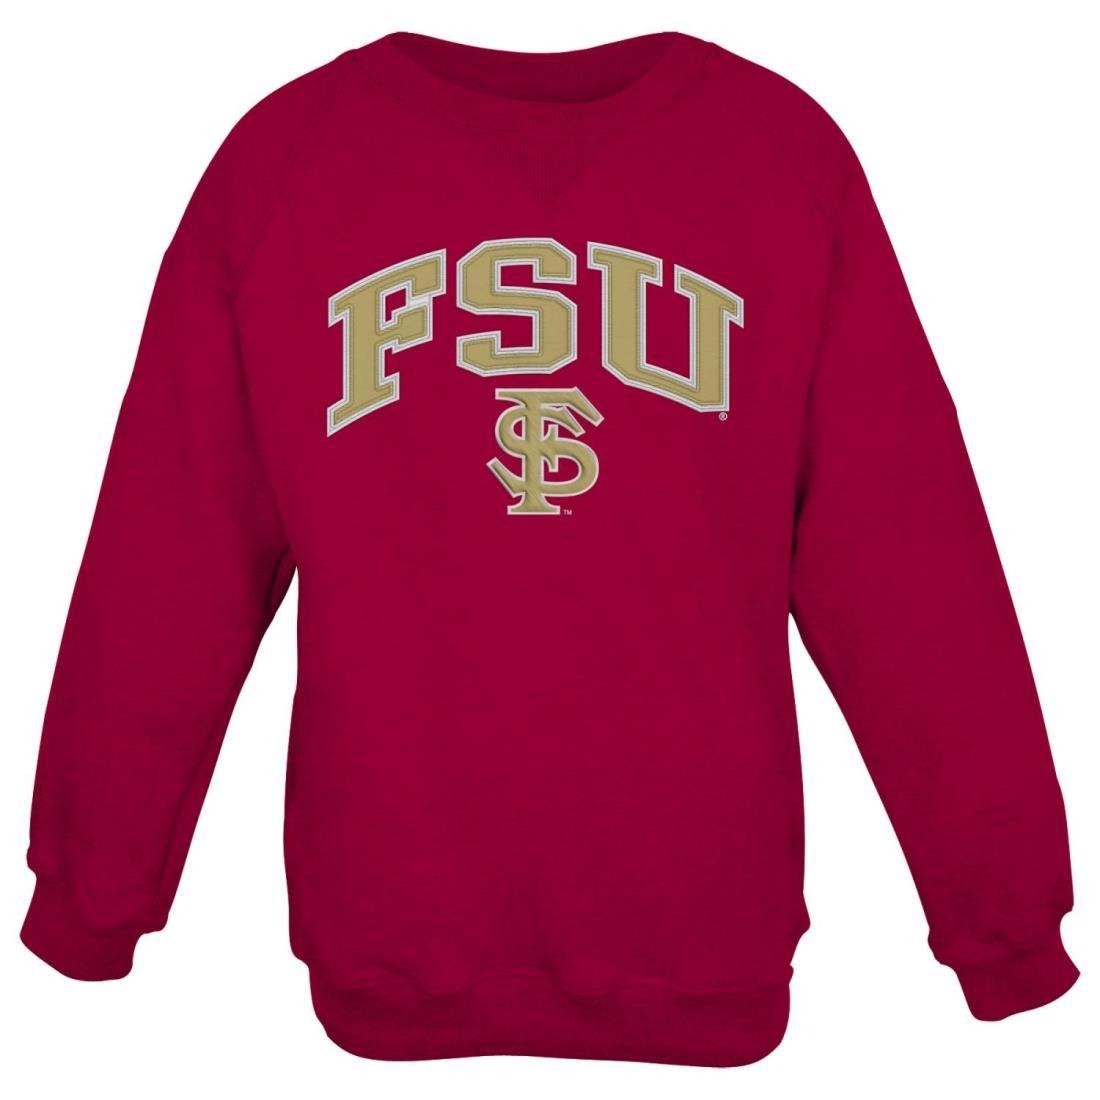 Florida State Seminolesガーネット刺繍Gameday Crewスウェットシャツ Large  B00NTAMILW